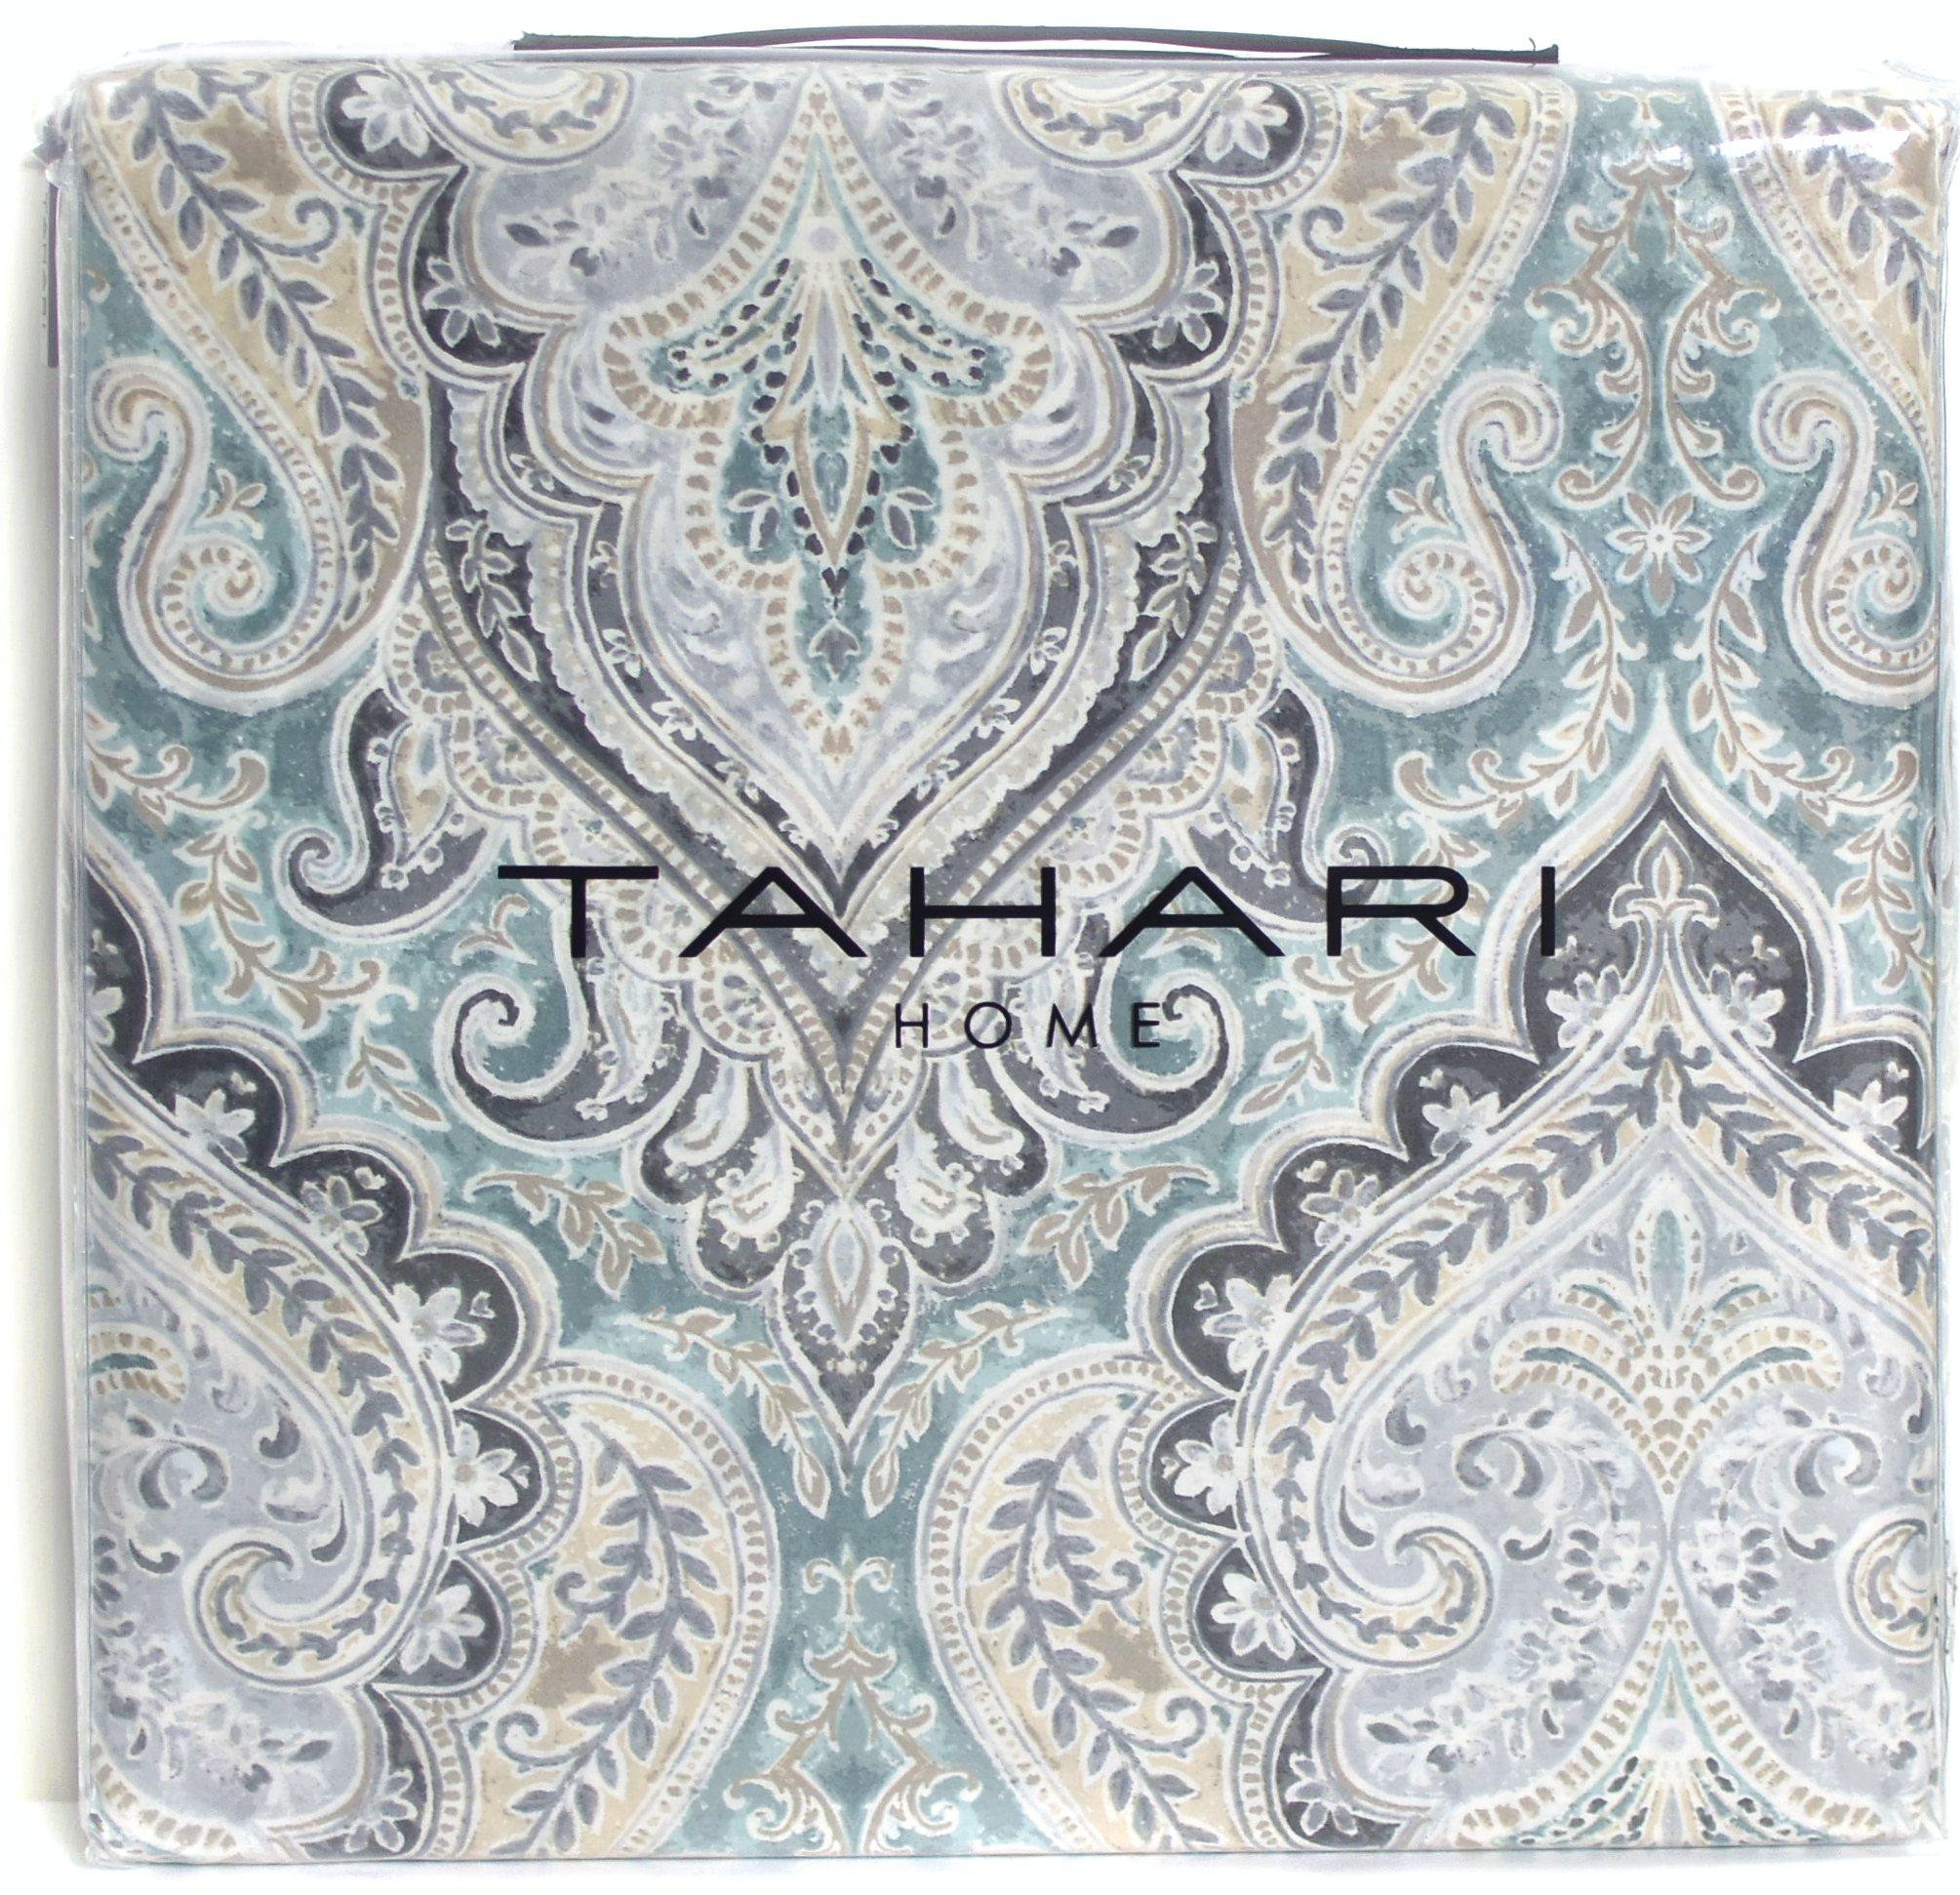 Tahari Home Luxury Bohemian Duvet Cover Luxury Boho Style Medallion Print in Blue Grey 3 Piece Bedding Set (Queen, Spa)